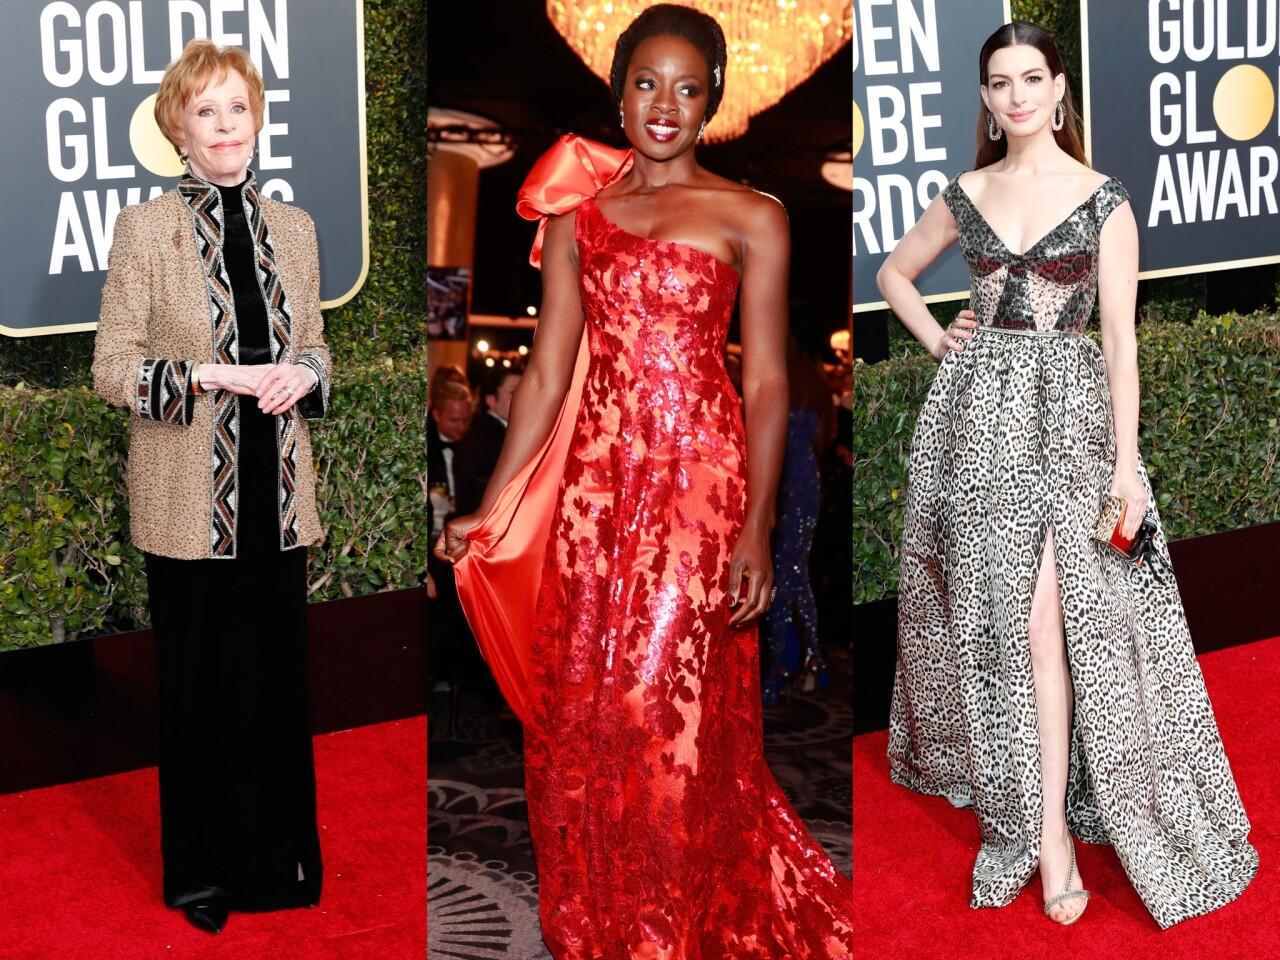 The best and worst looks of the 2019 Golden Globe Awards. From left: Carol Burnett, Danai Gurira and Anne Hathaway.